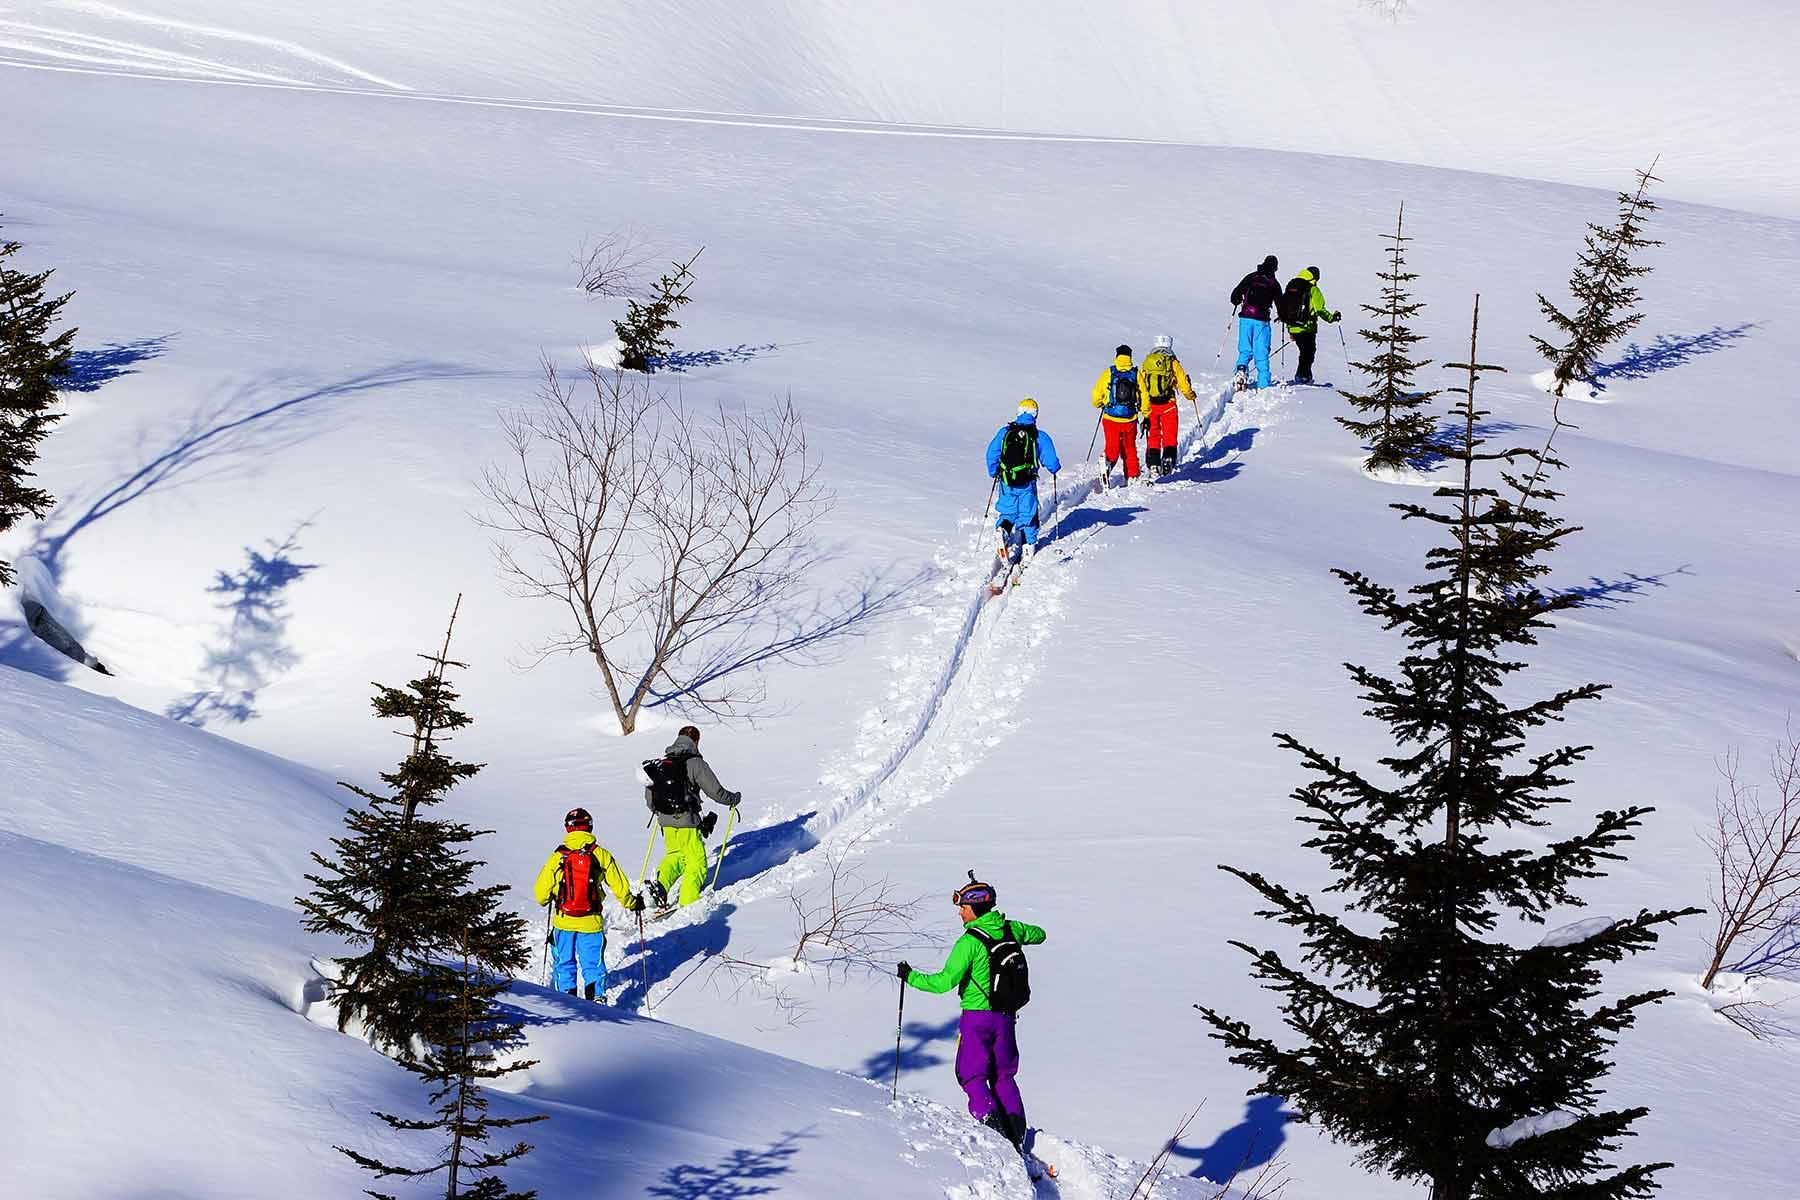 ski touring in hakuba